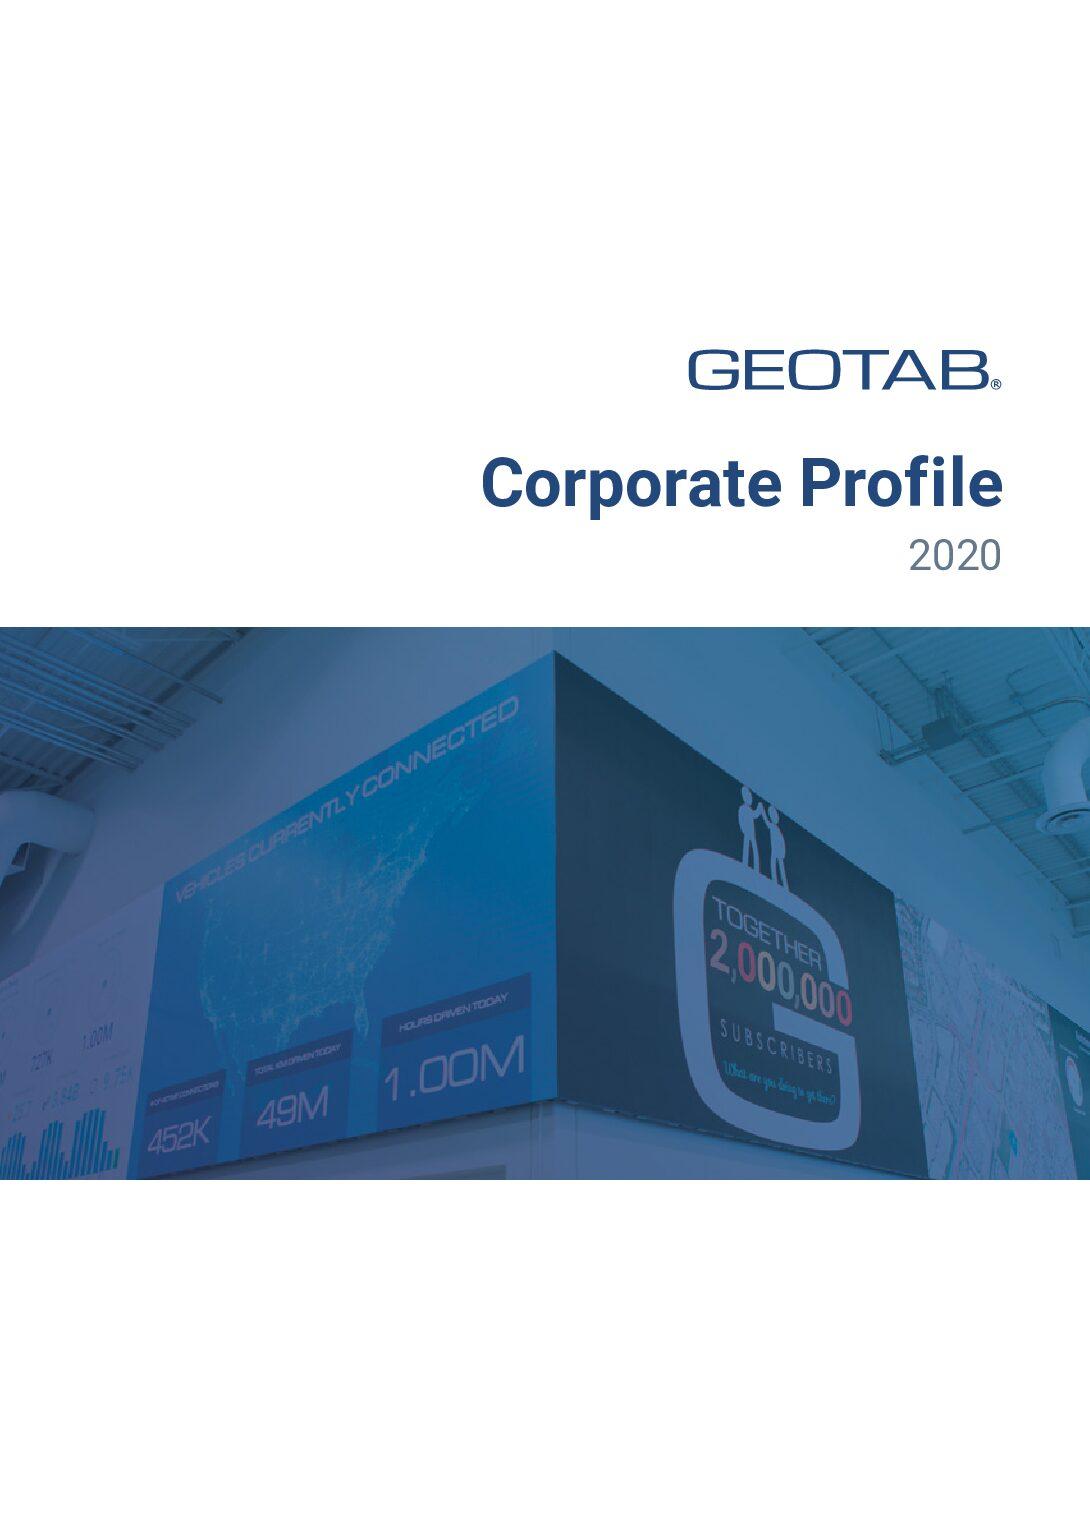 Geotab Corporate Profile